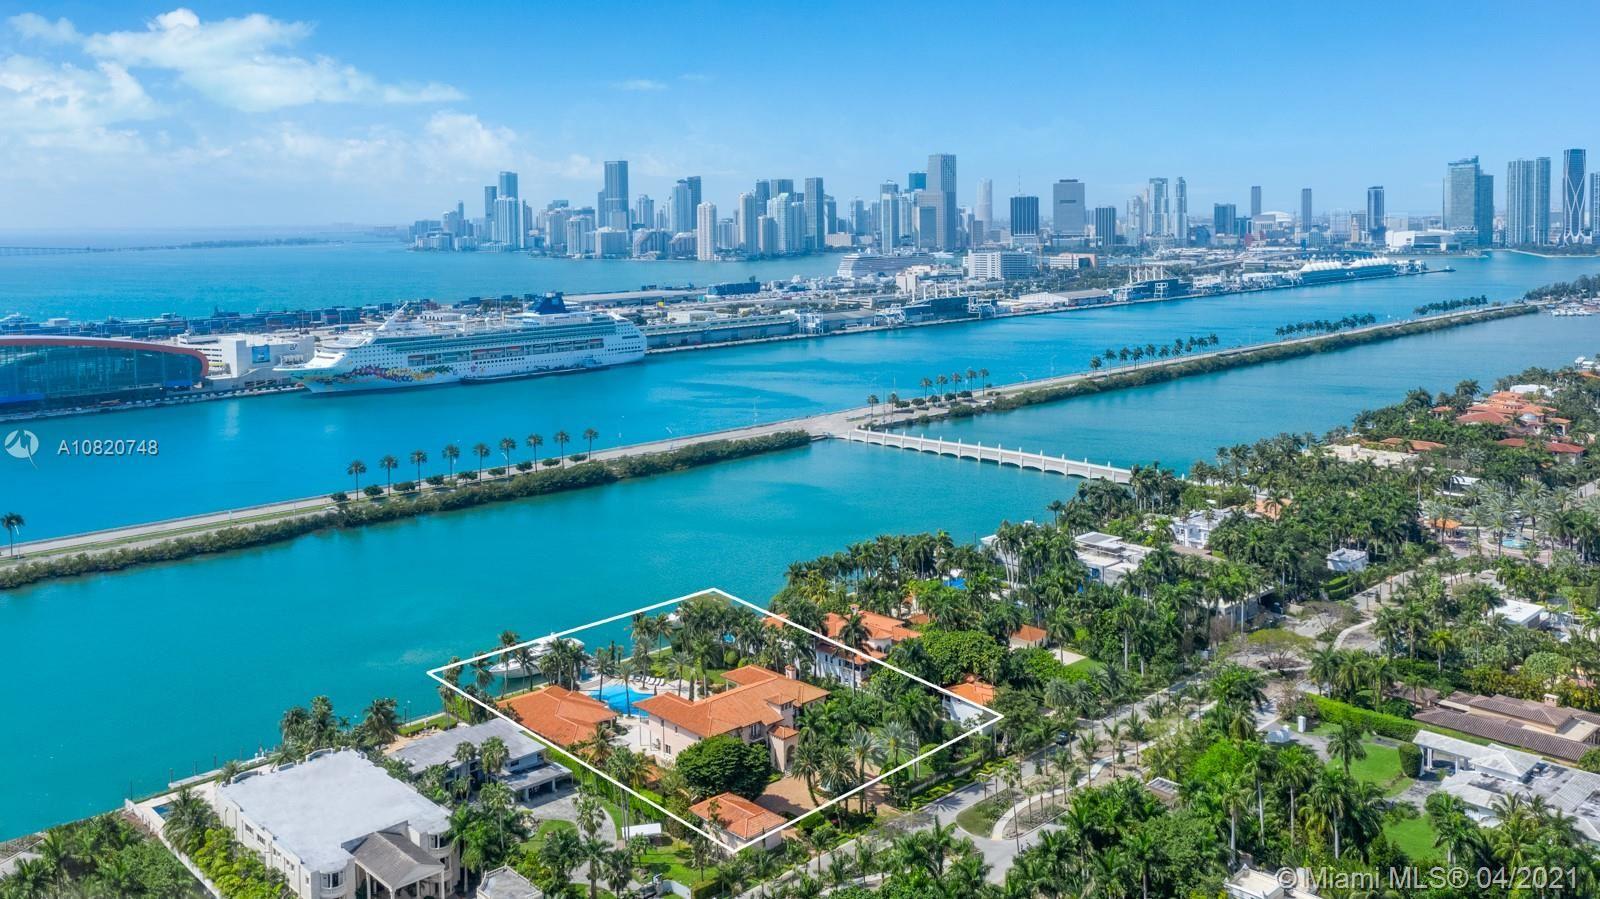 Photo of 94 Palm Ave, Miami Beach, FL 33139 (MLS # A10820748)